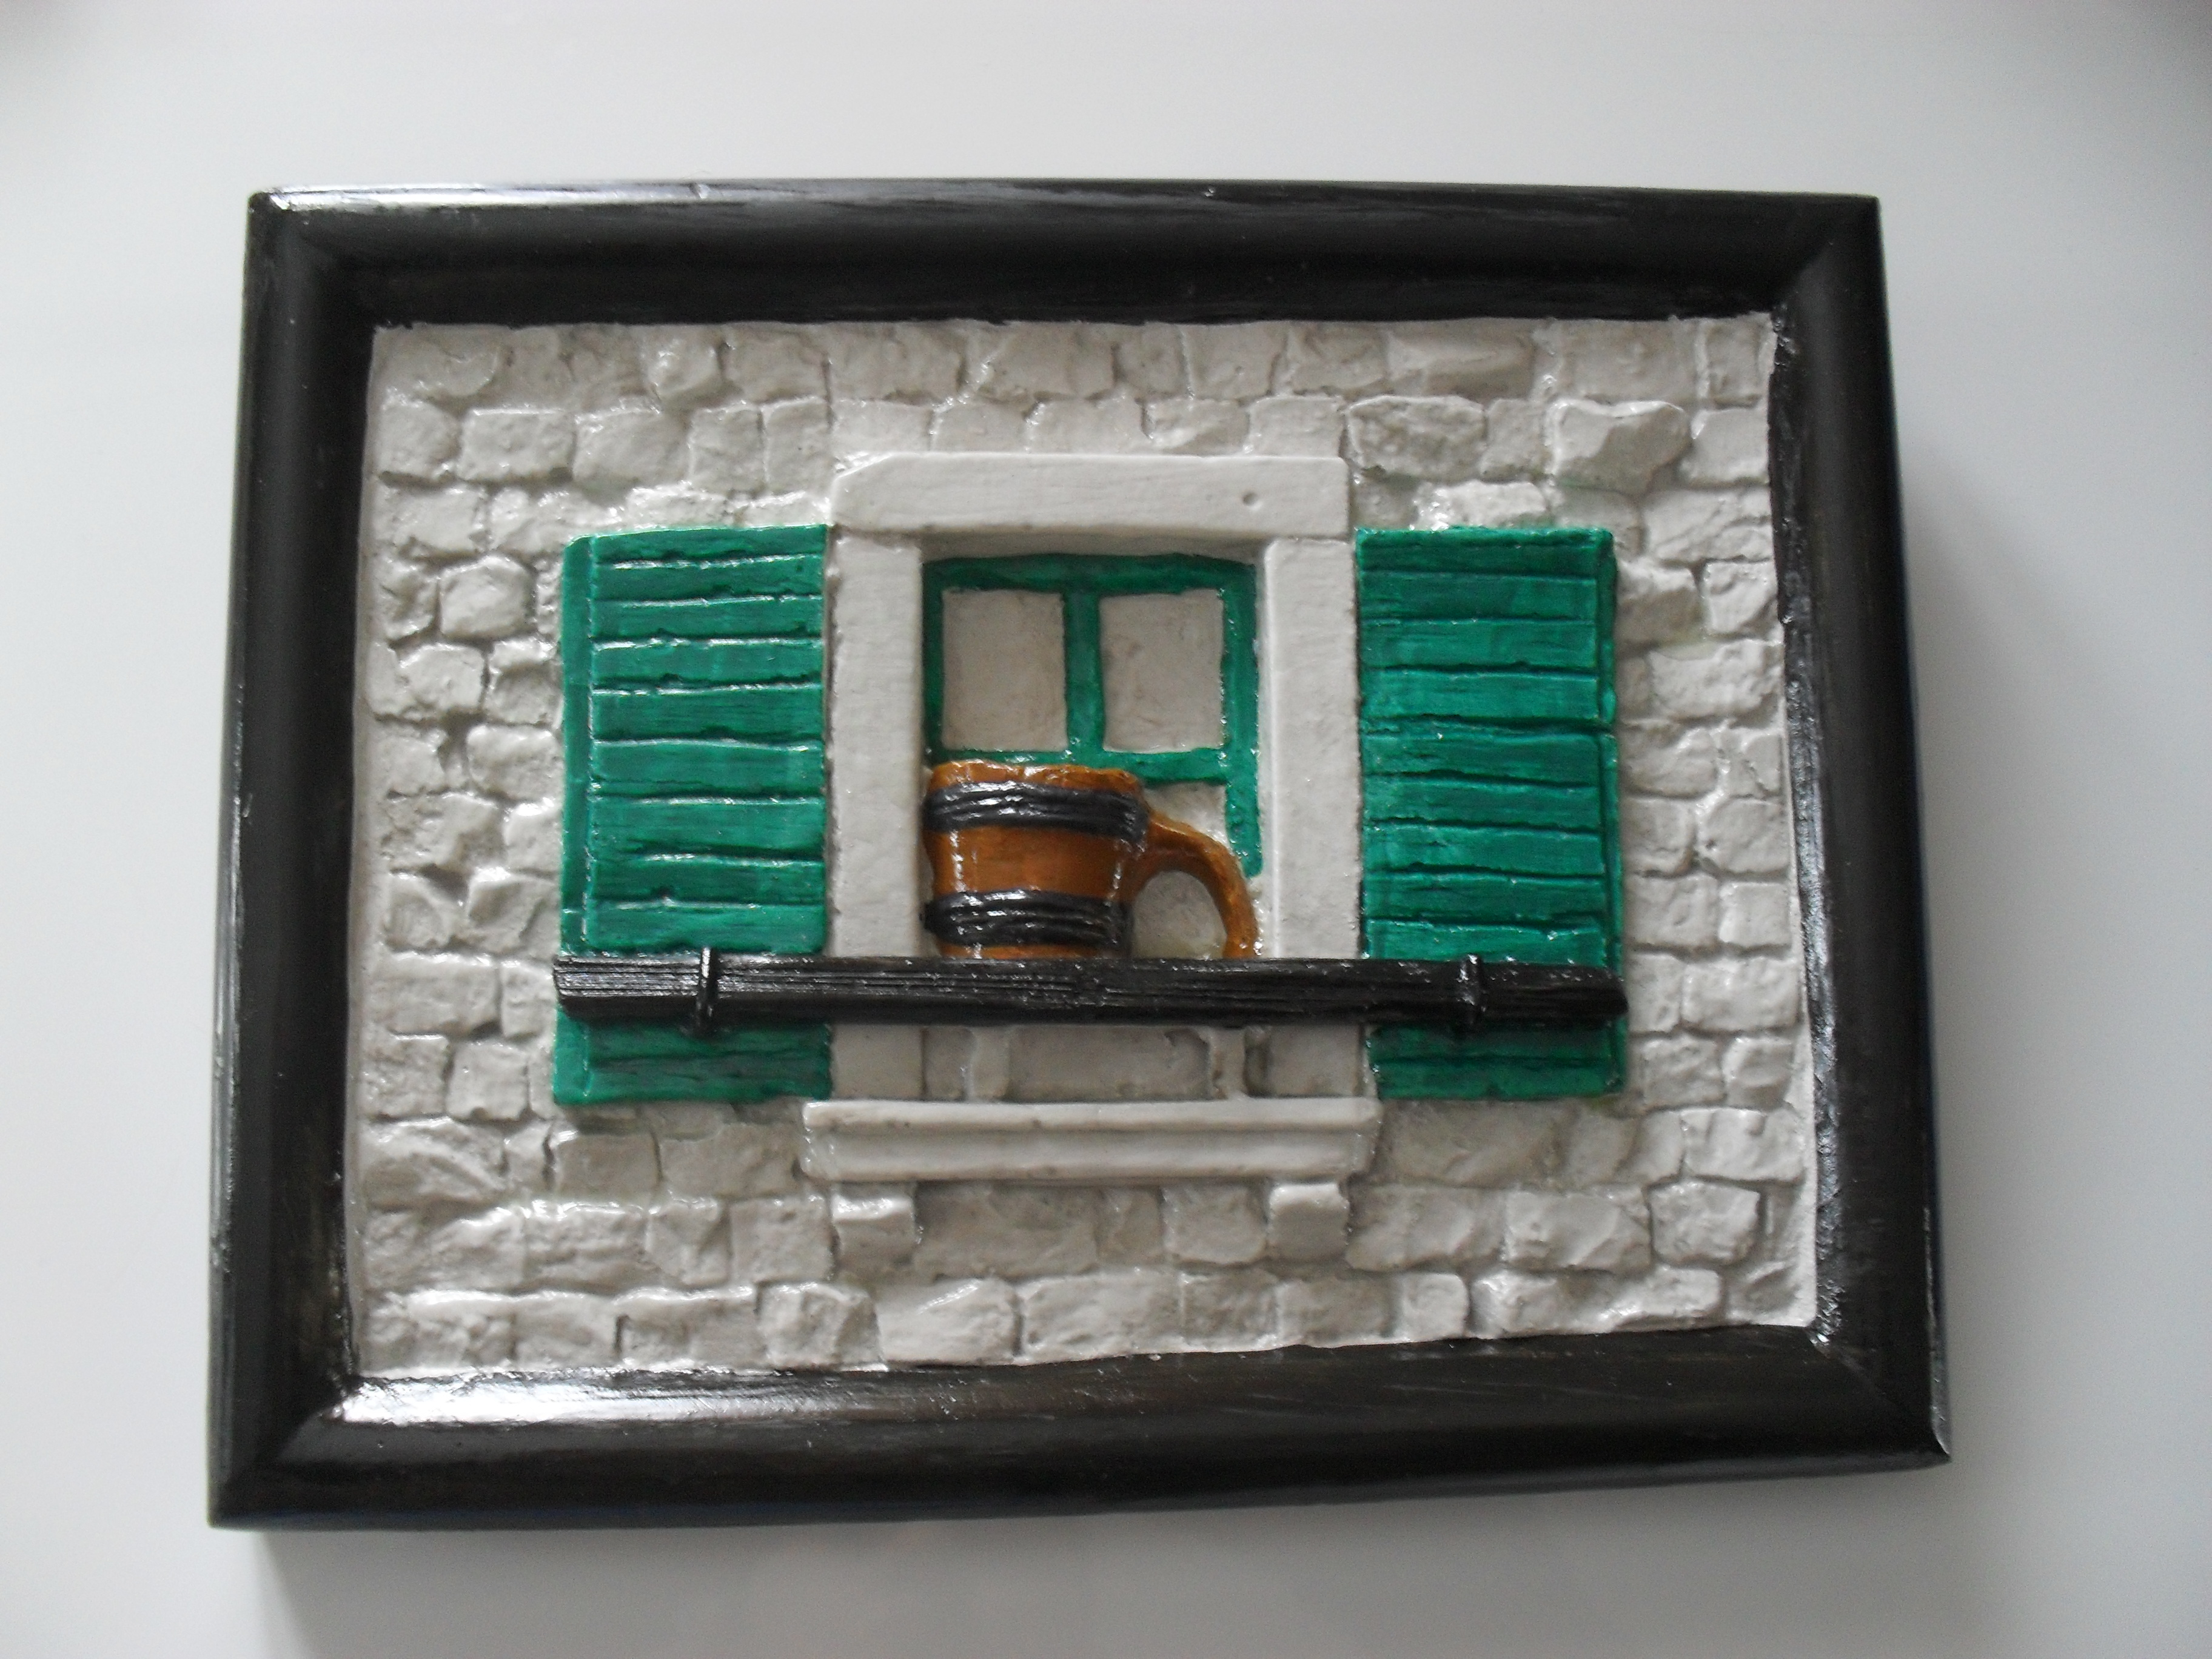 Naziv: Benkovac – Kaštel    Dimenzije:  š*v = 18 x 16 cm    Napomena: Pozadi se nalazi  zakačka za kačenje na zid